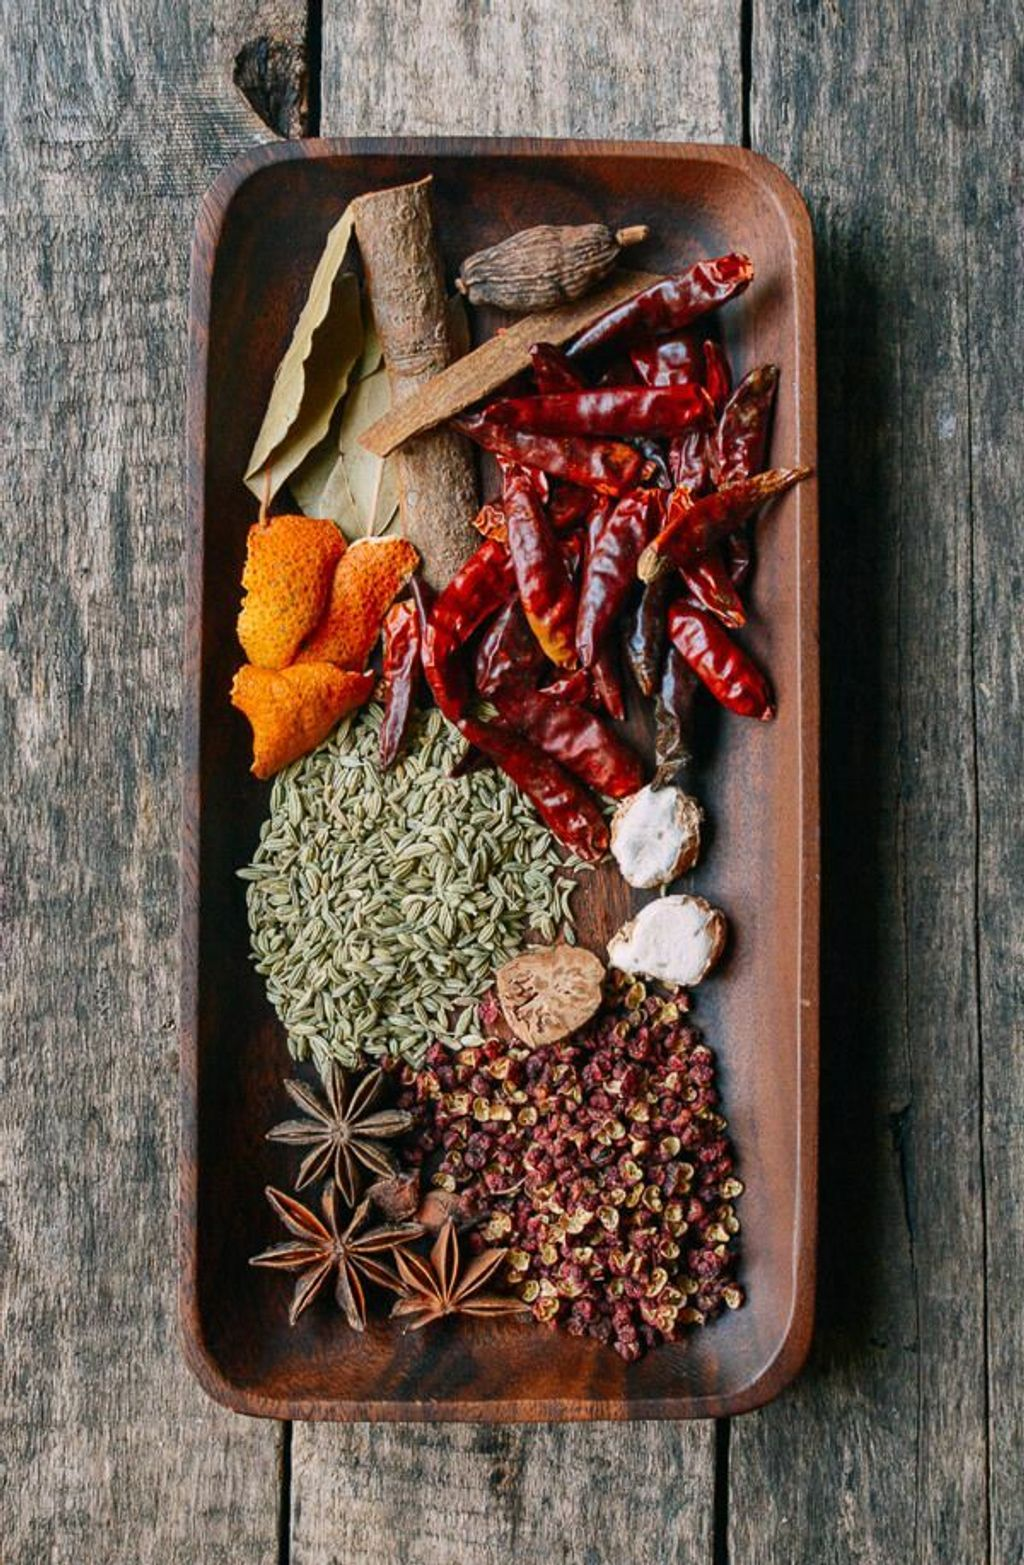 Ma La Xiang Guo (Spicy Numbing Stir-fry Pot).jpg